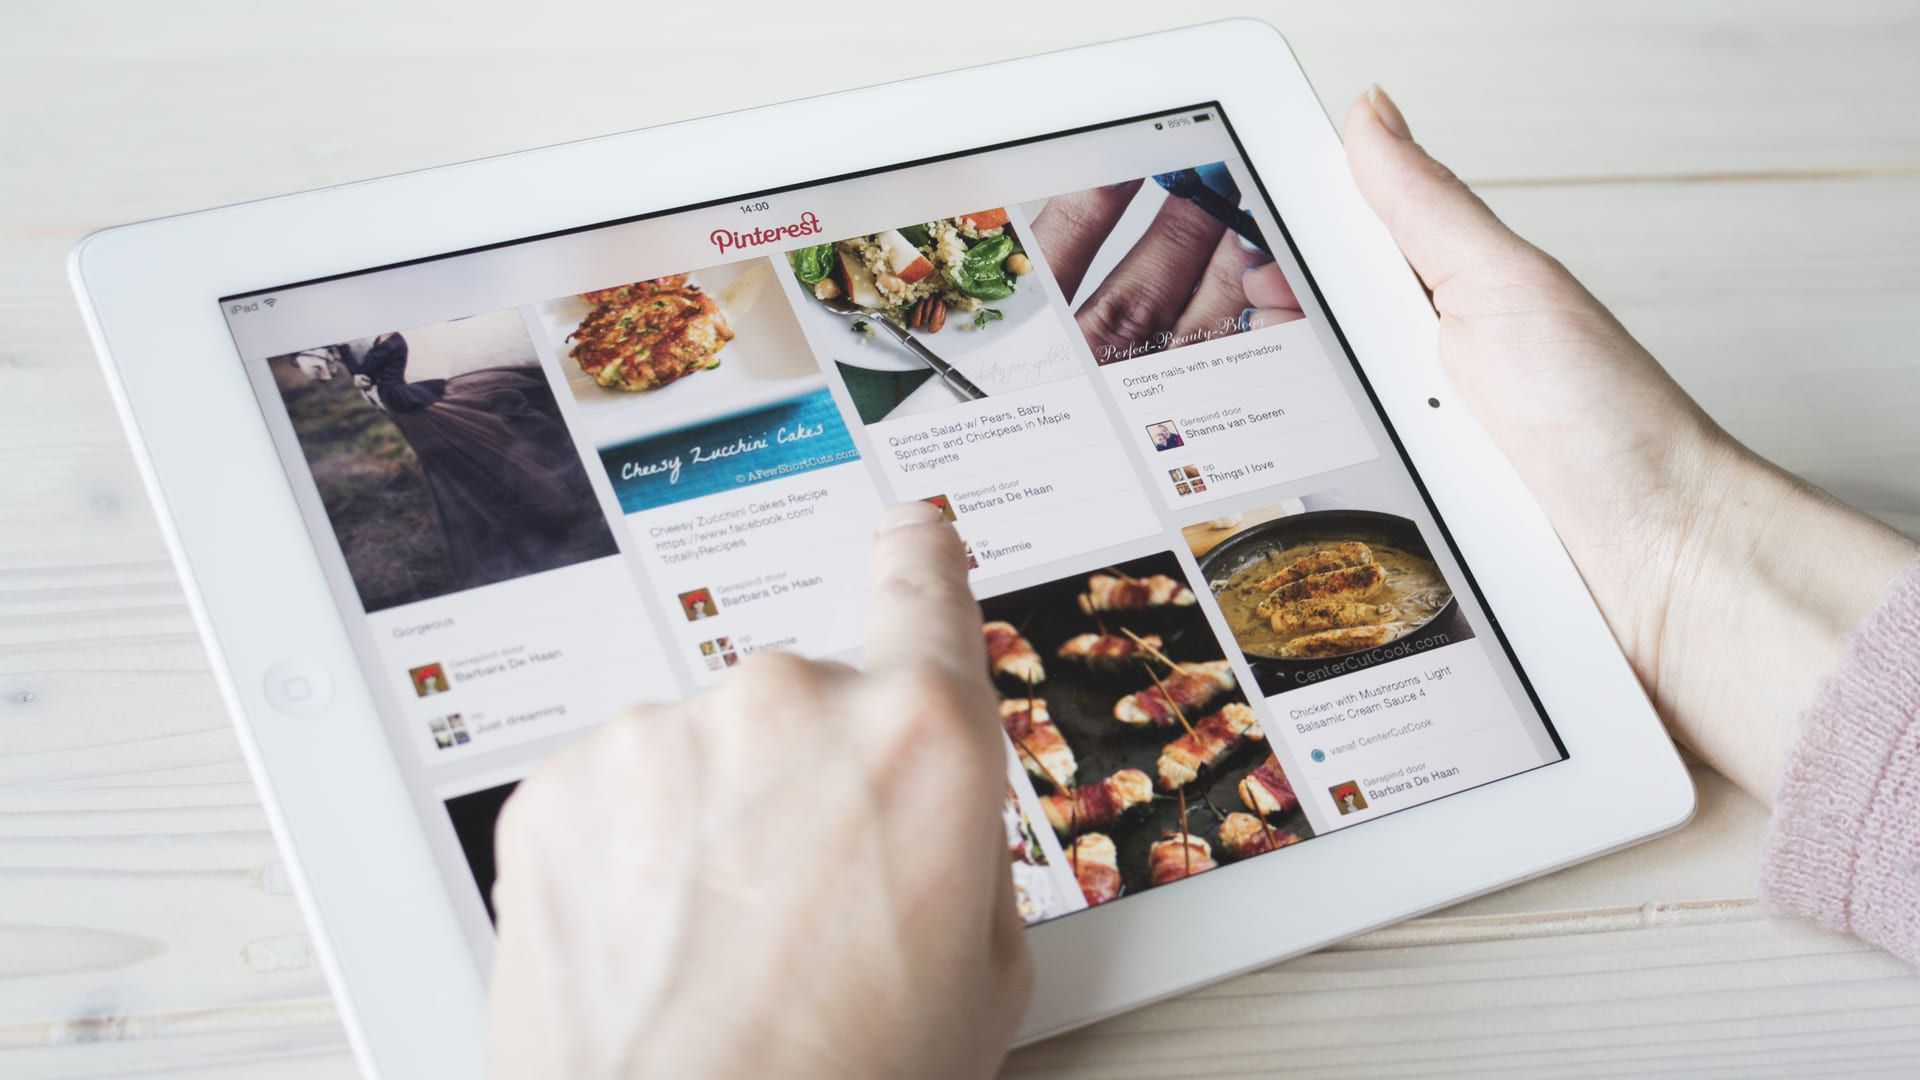 Saiba o que é Pinterest e como usá-lo (Foto: Shuttestock)